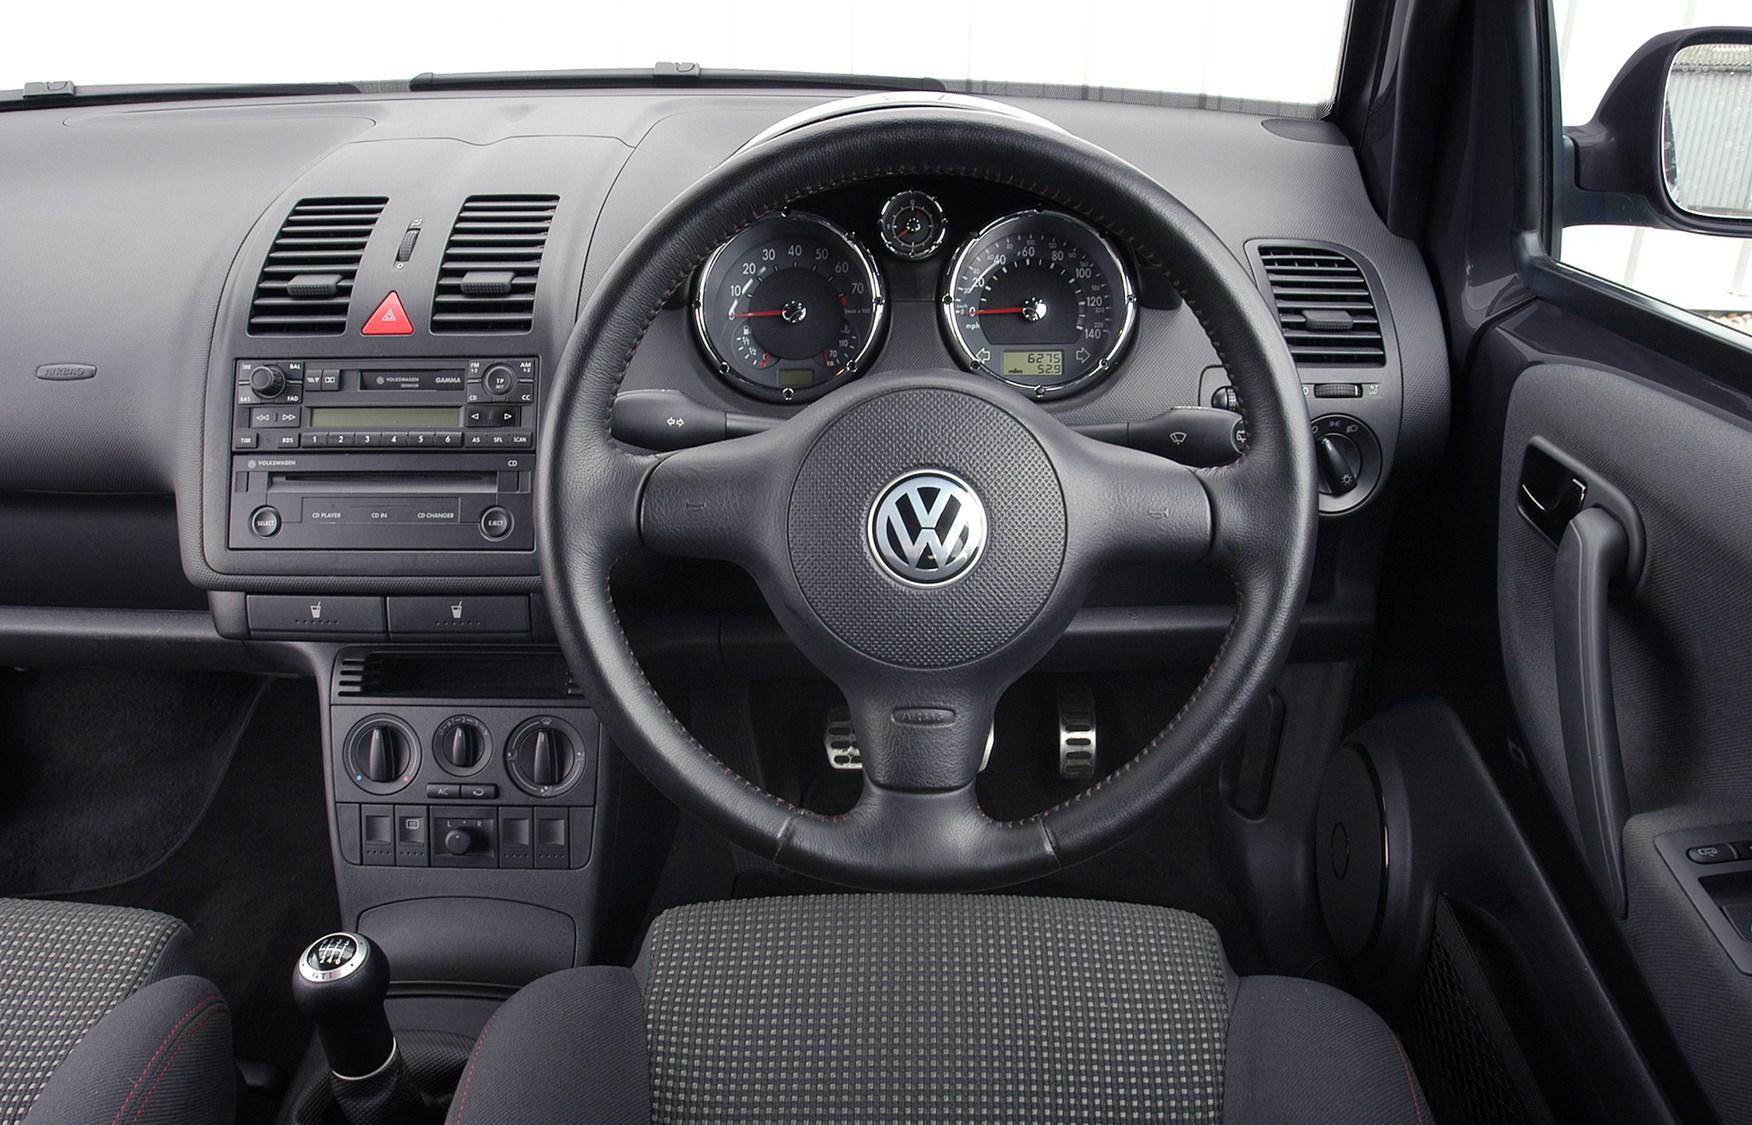 volkswagen lupo hatchback review   parkers